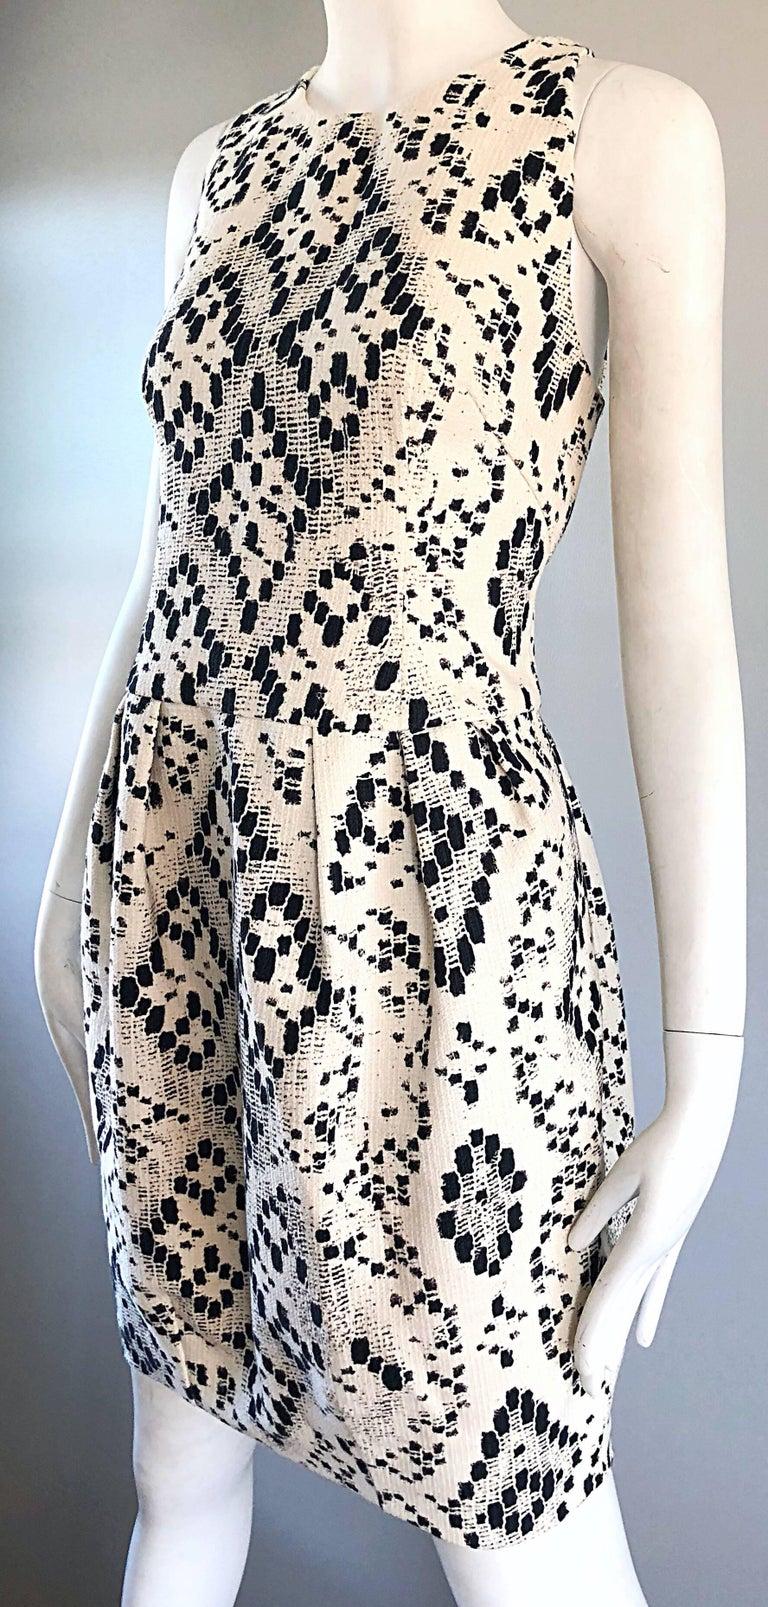 Women's Giambattista Valli Size 10 / 12 Black and White Abstract Sleeveless Dress For Sale